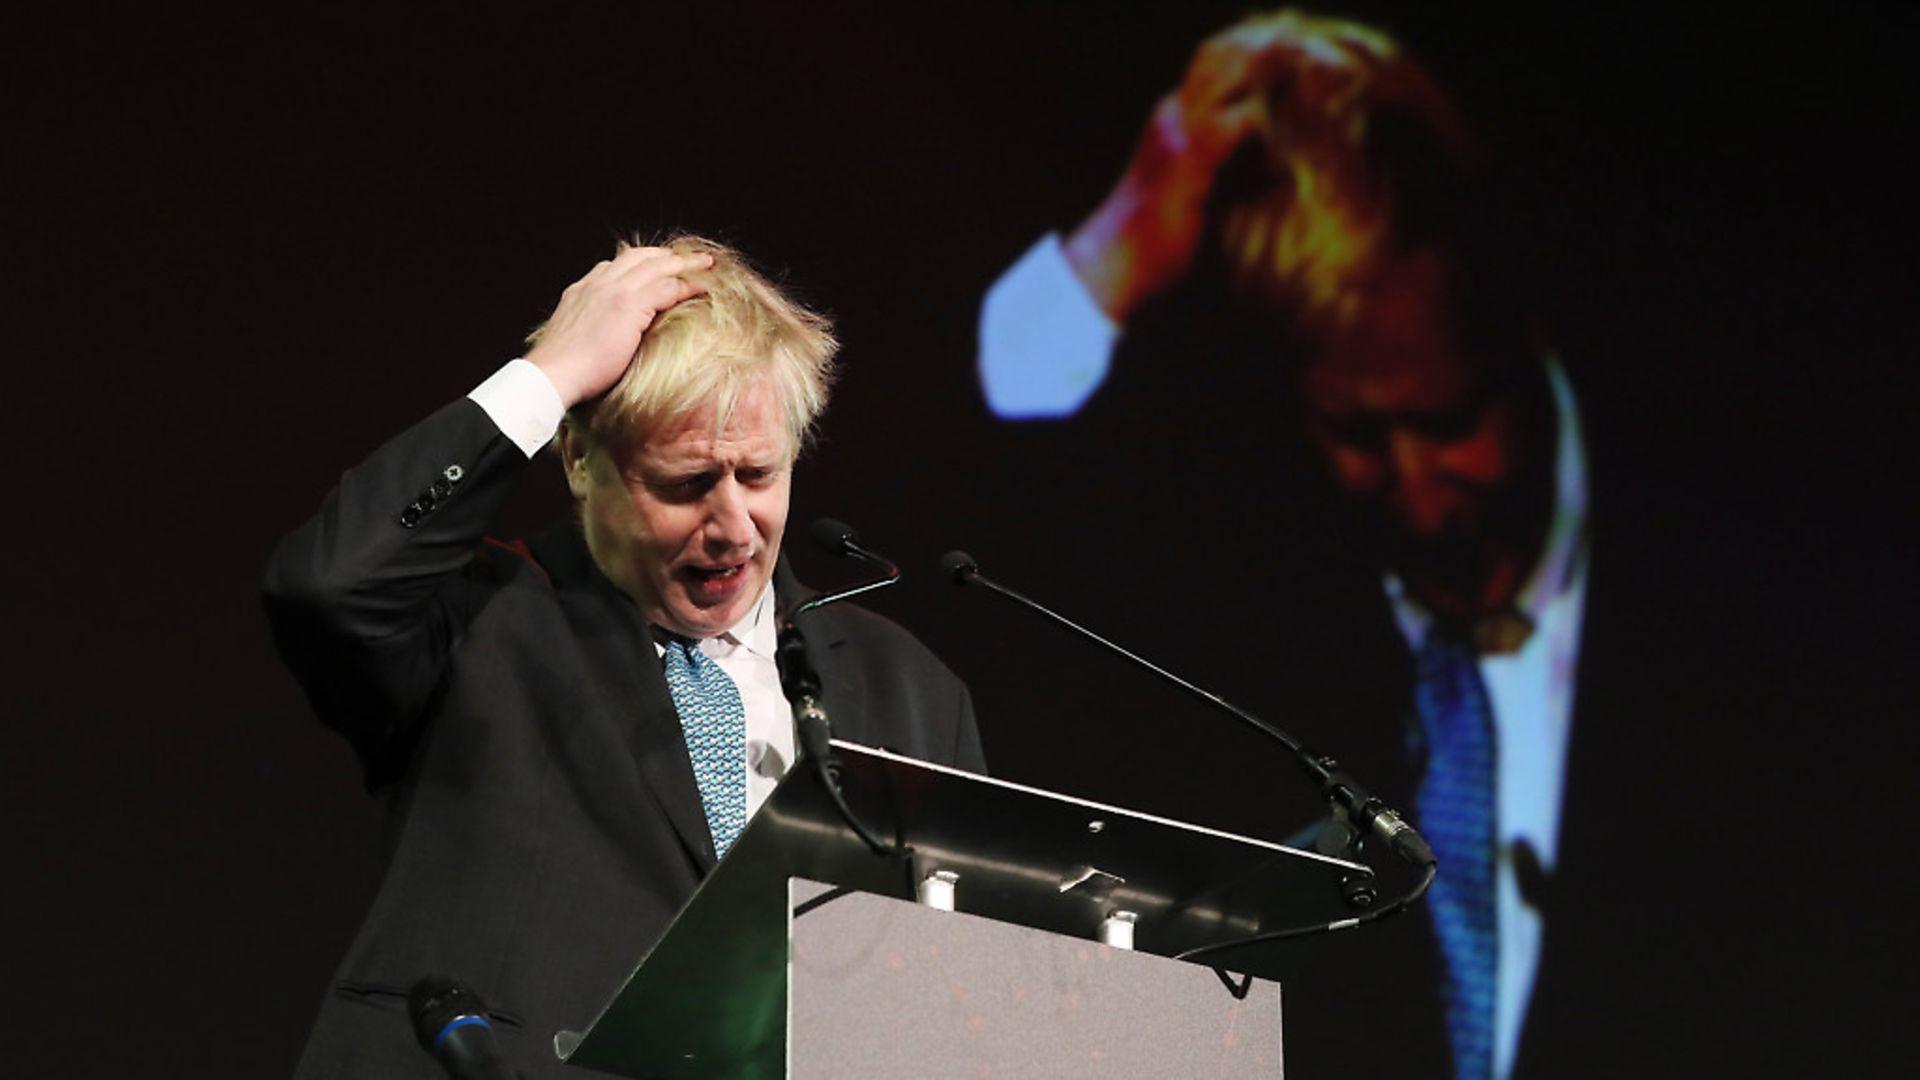 Boris Johnson. Photograph: Brian Lawless/PA. - Credit: PA Wire/PA Images